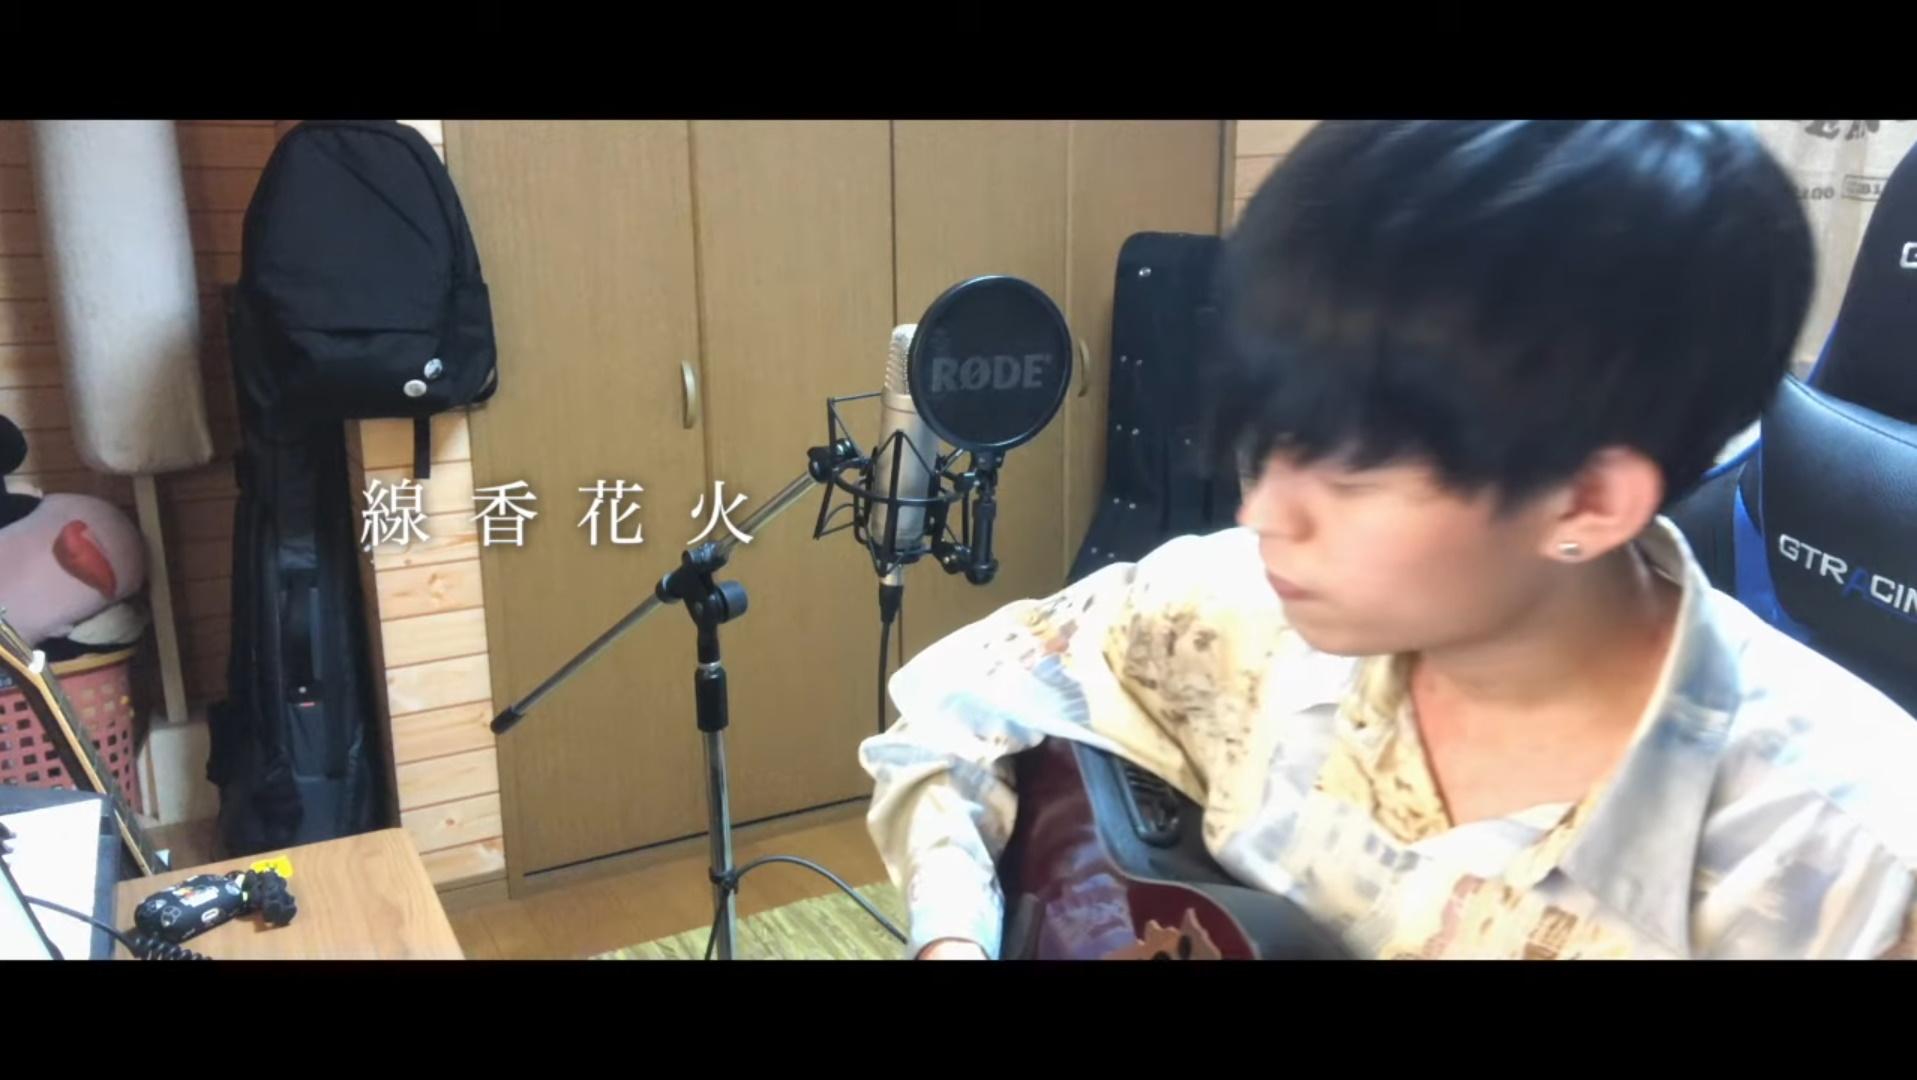 『Tani Yuuki - 線香花火』収録の『線香花火』ジャケット